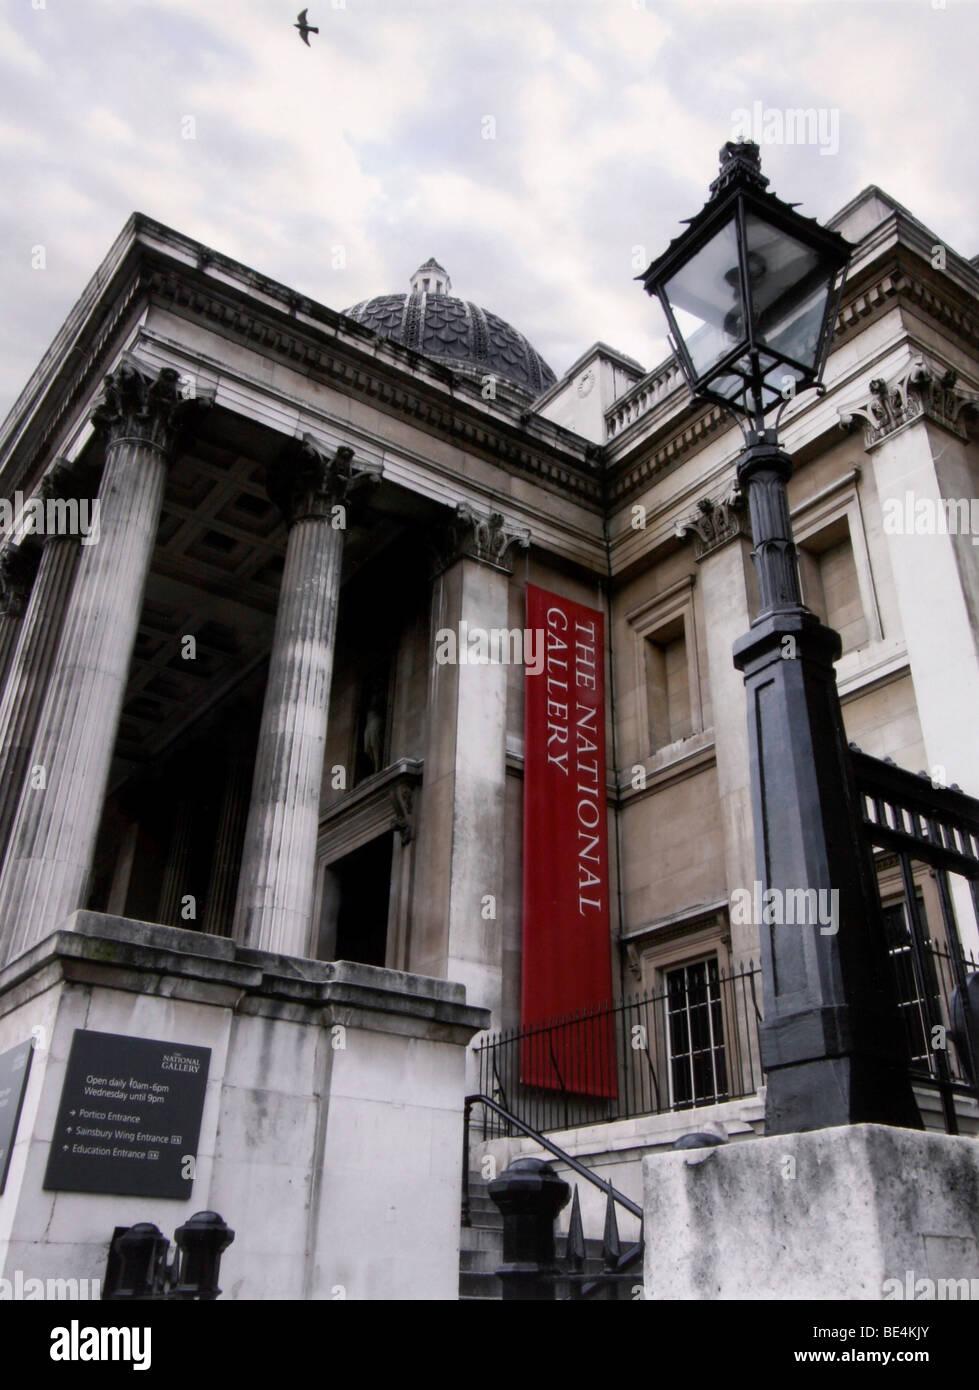 National Gallery, London, England, United Kingdom, Europe Stock Photo